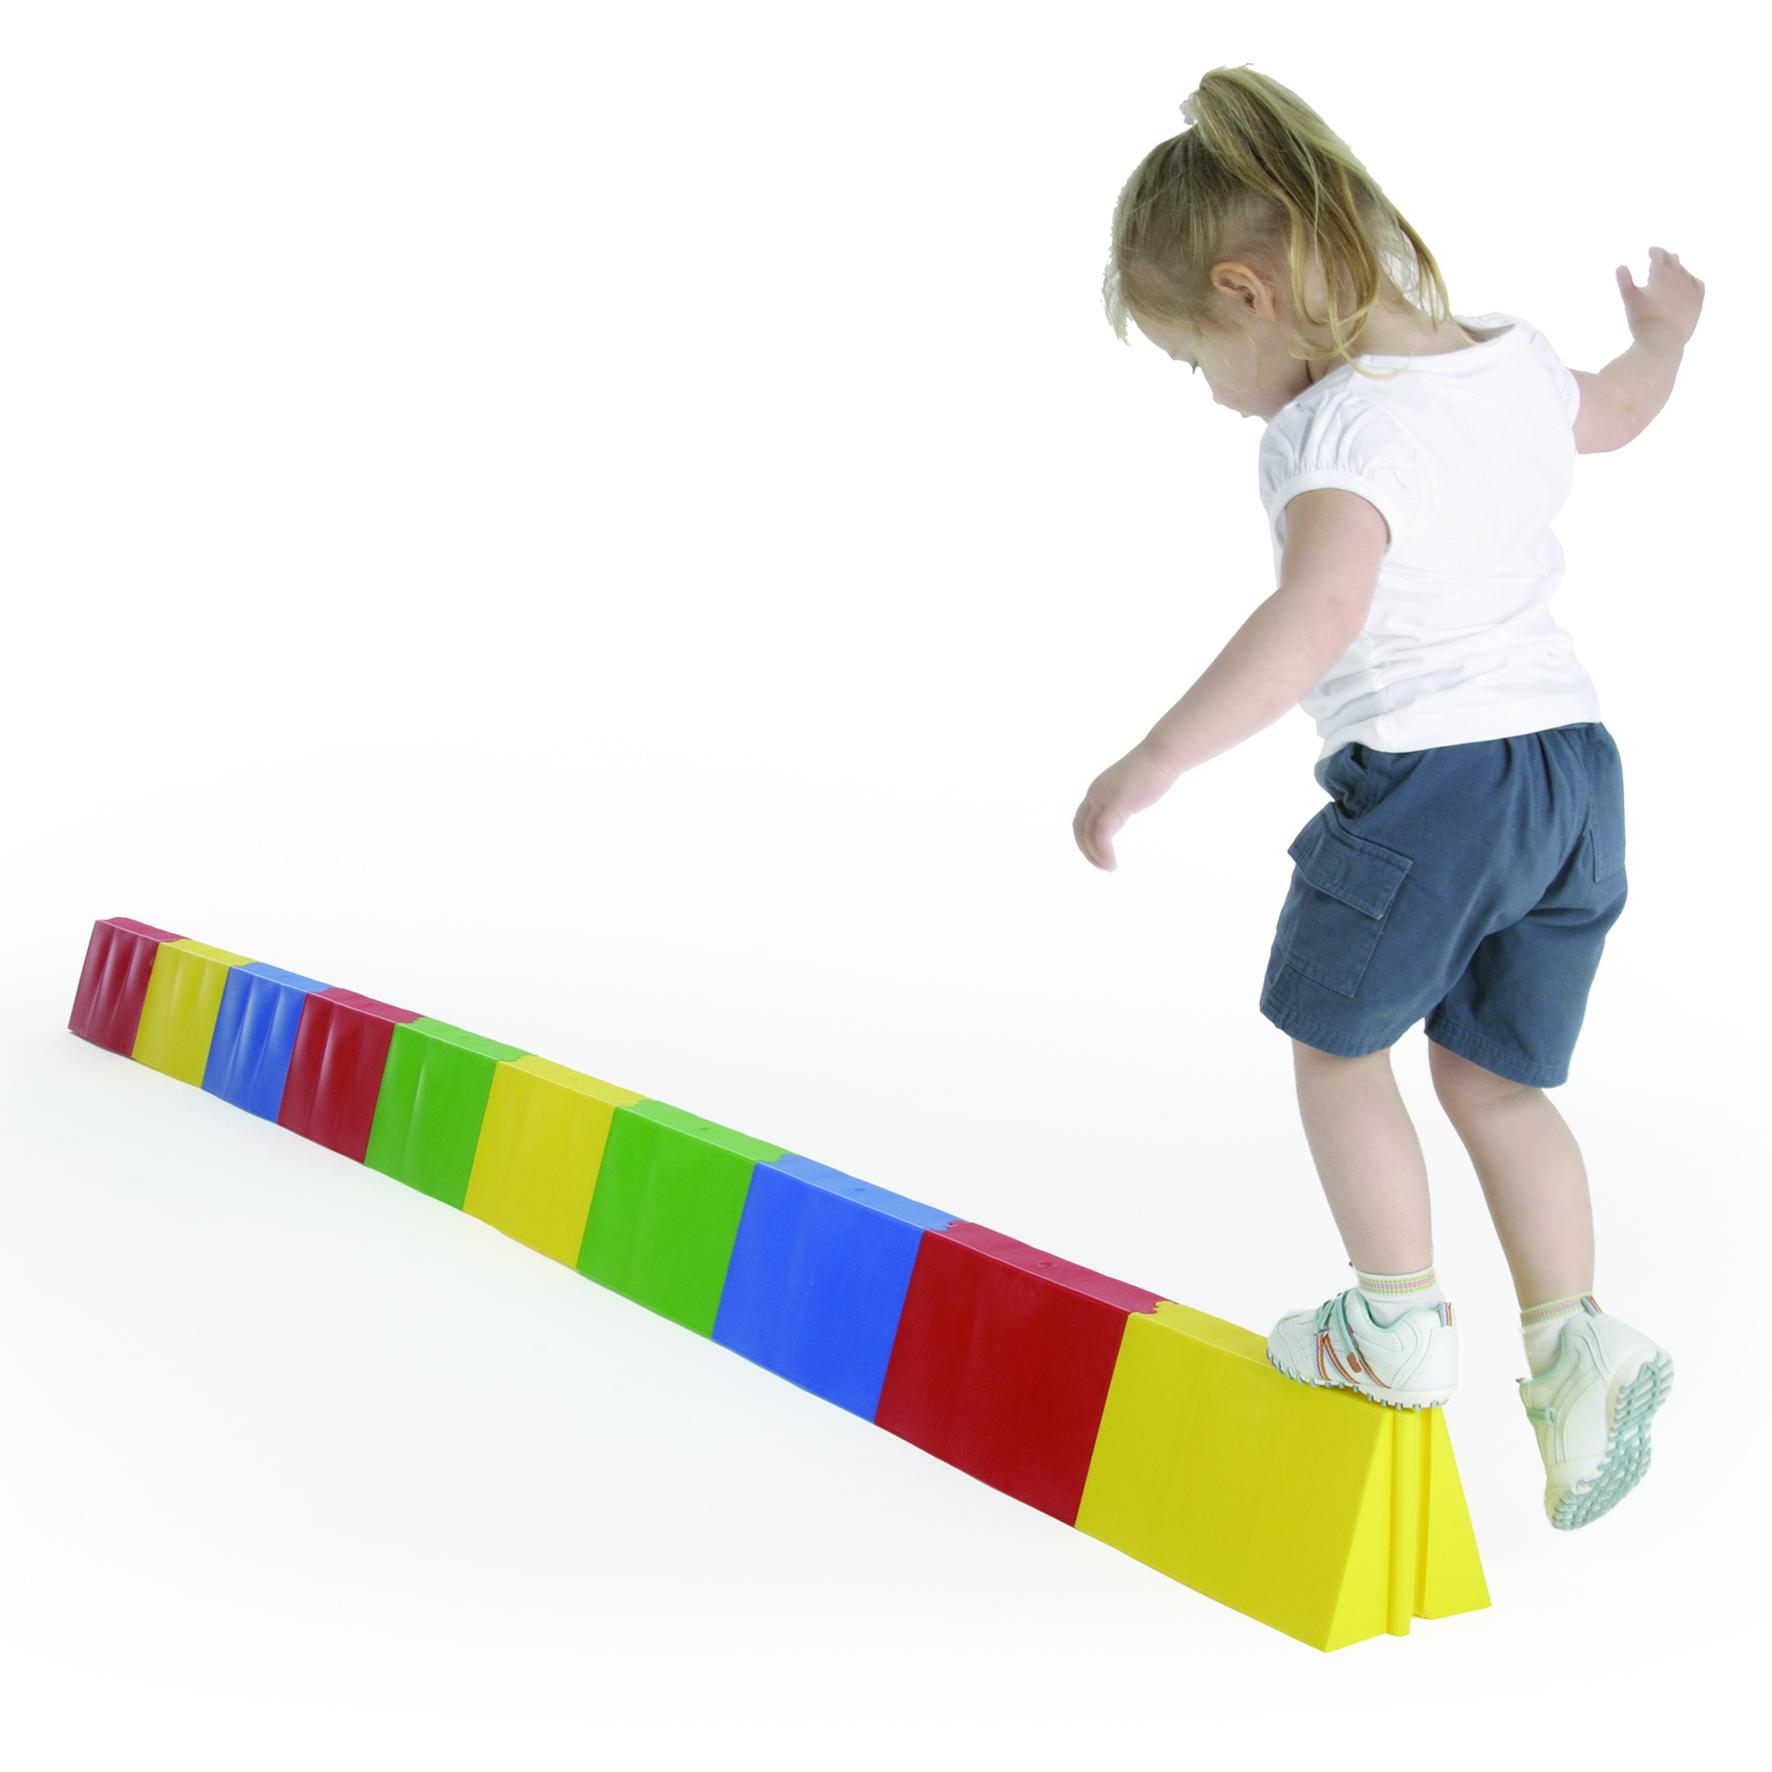 Junior Play - Movement & Balance